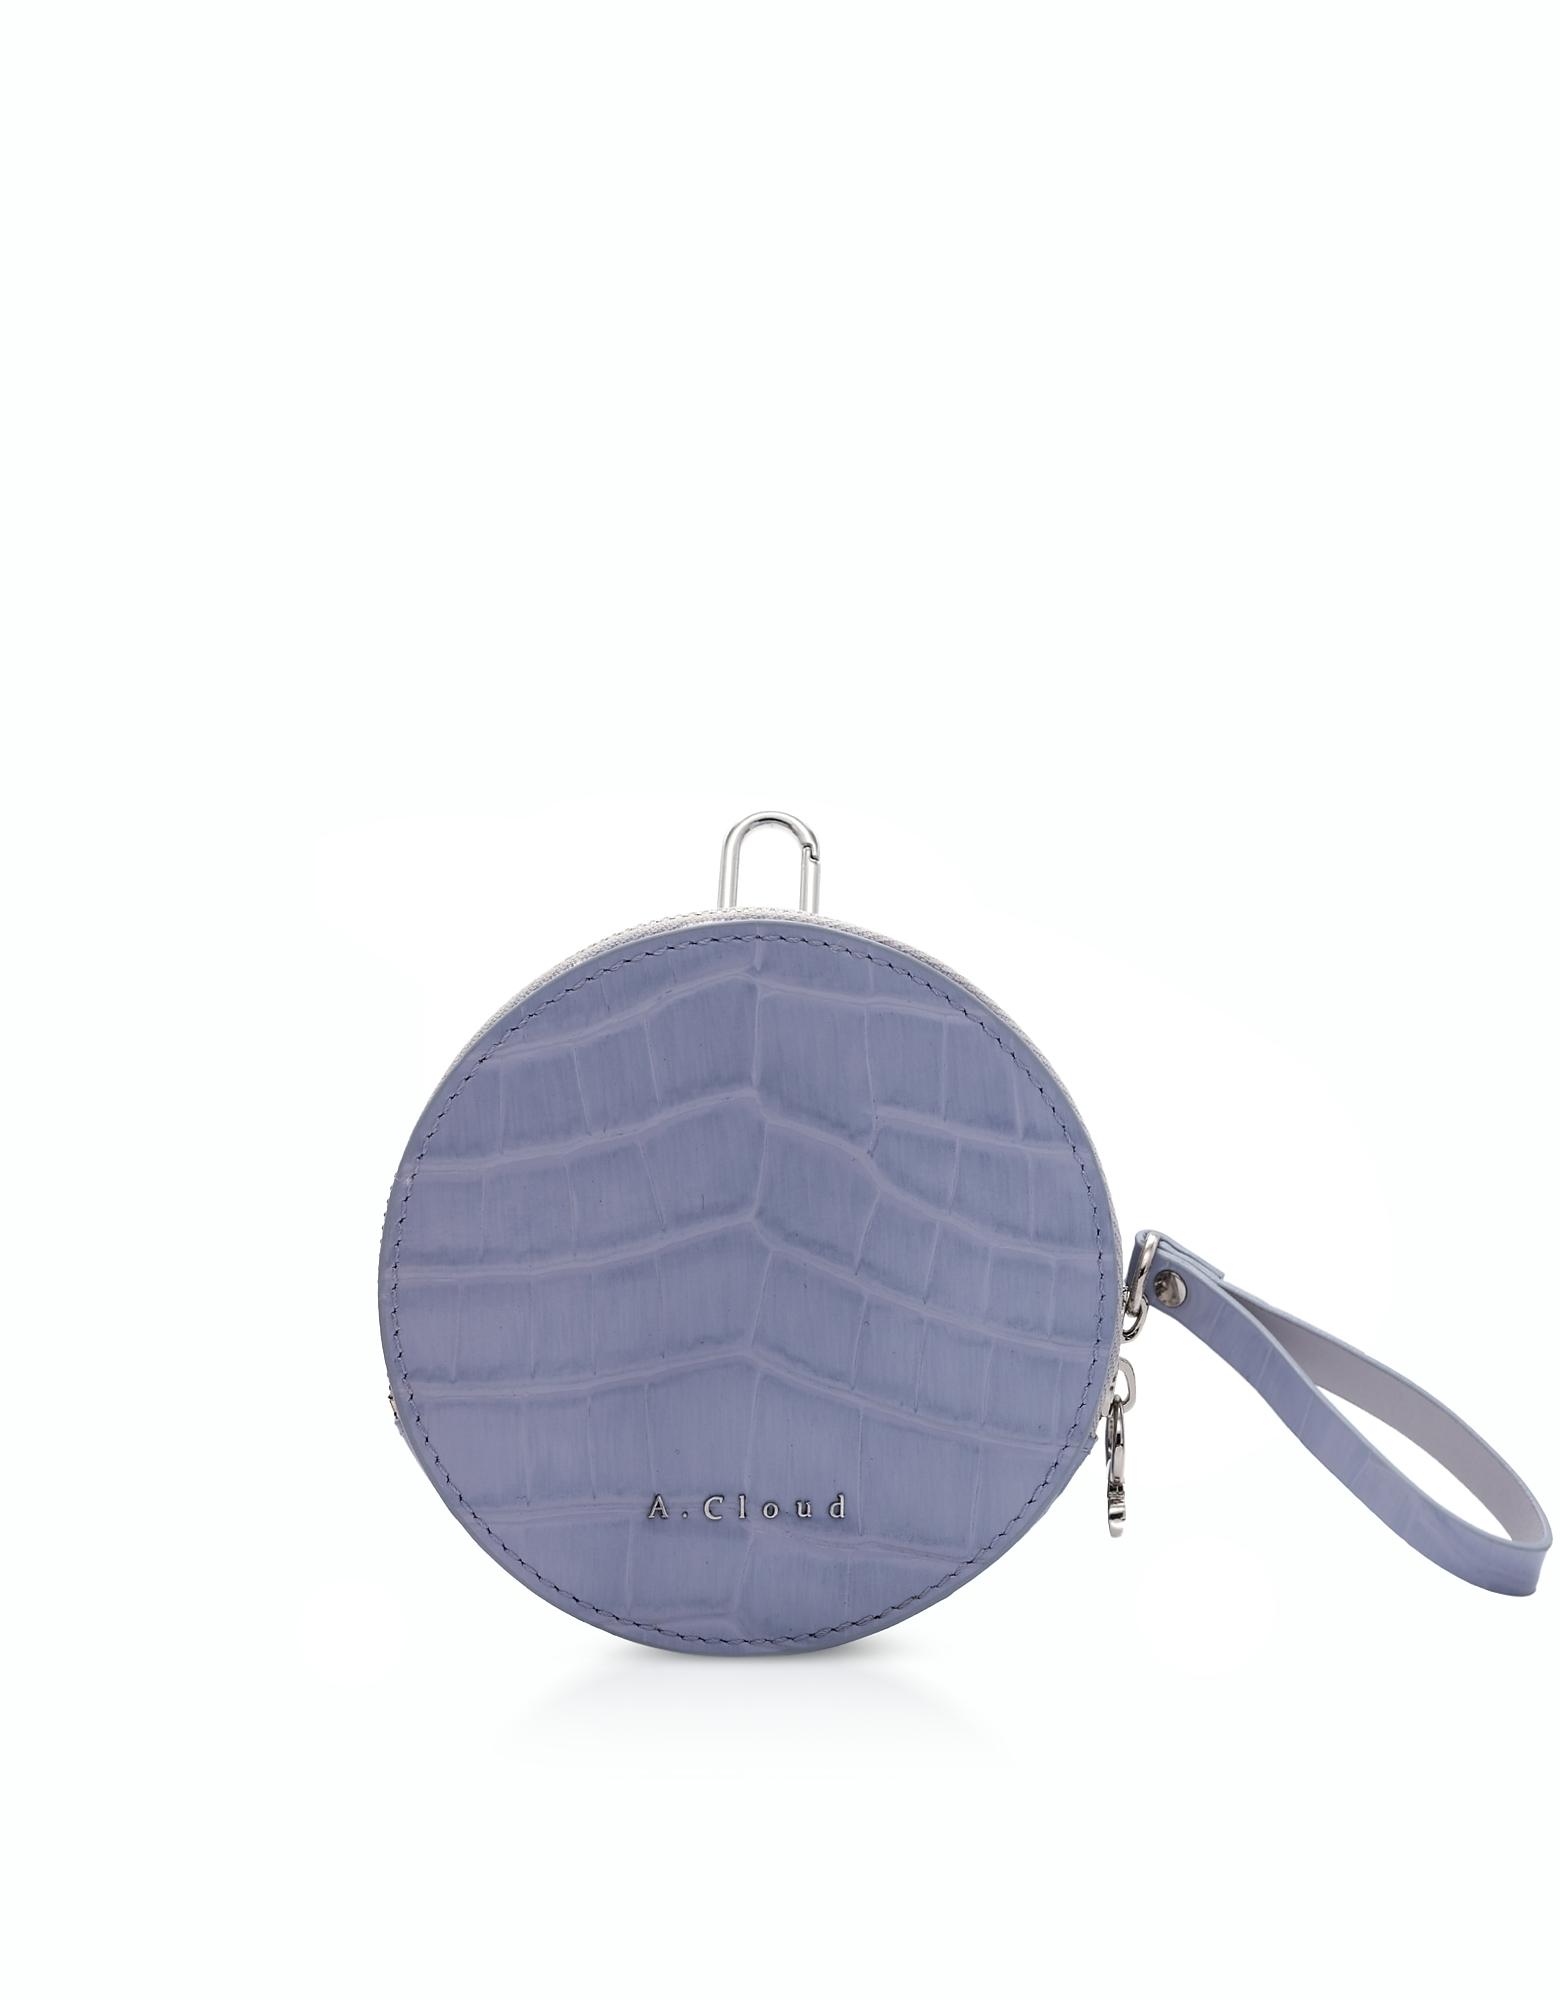 Forzieri coupon: A.Cloud  Handbags Moon/UFO Mini Round Bag